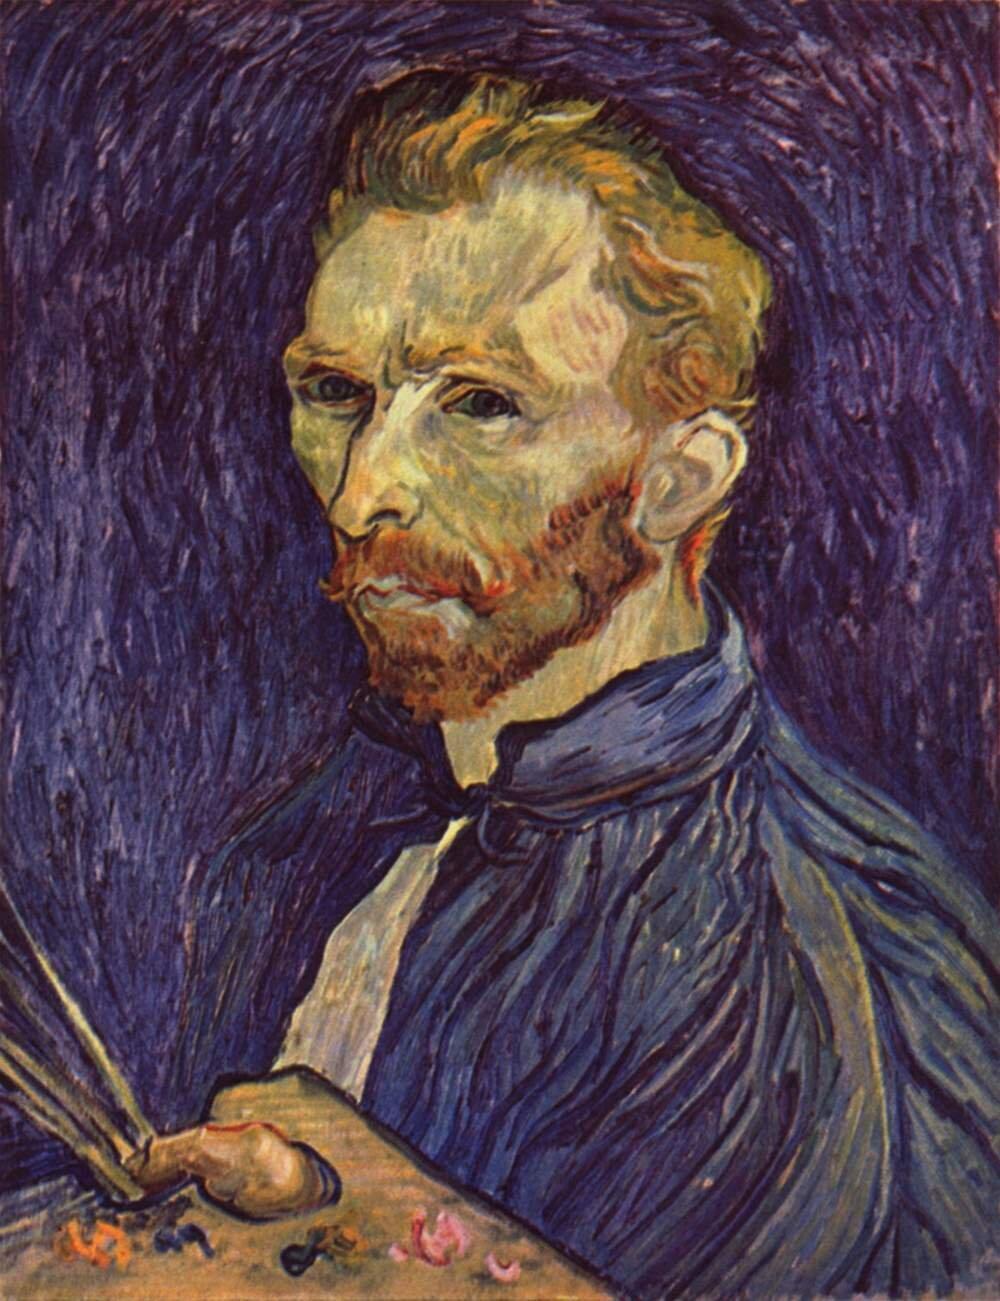 Autoportret (z paletą) Źródło: Vincent van Gogh, Autoportret (z paletą), 1889, olej na płotnie, National Gallery of Art, Washington.